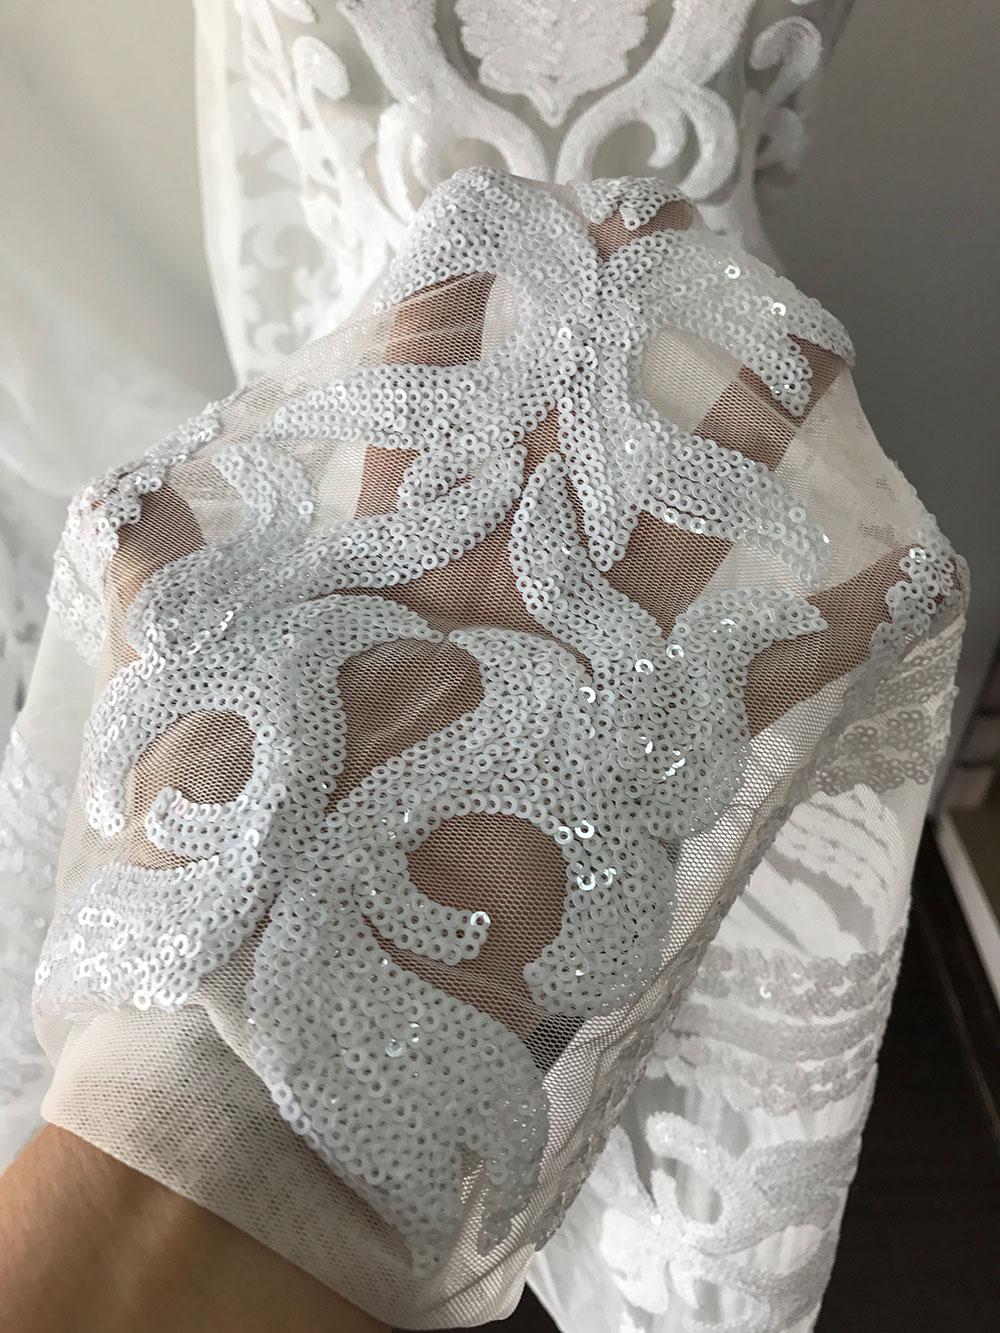 Bridal lace off white lace baroque bridal lace wedding Wedding dress design tool